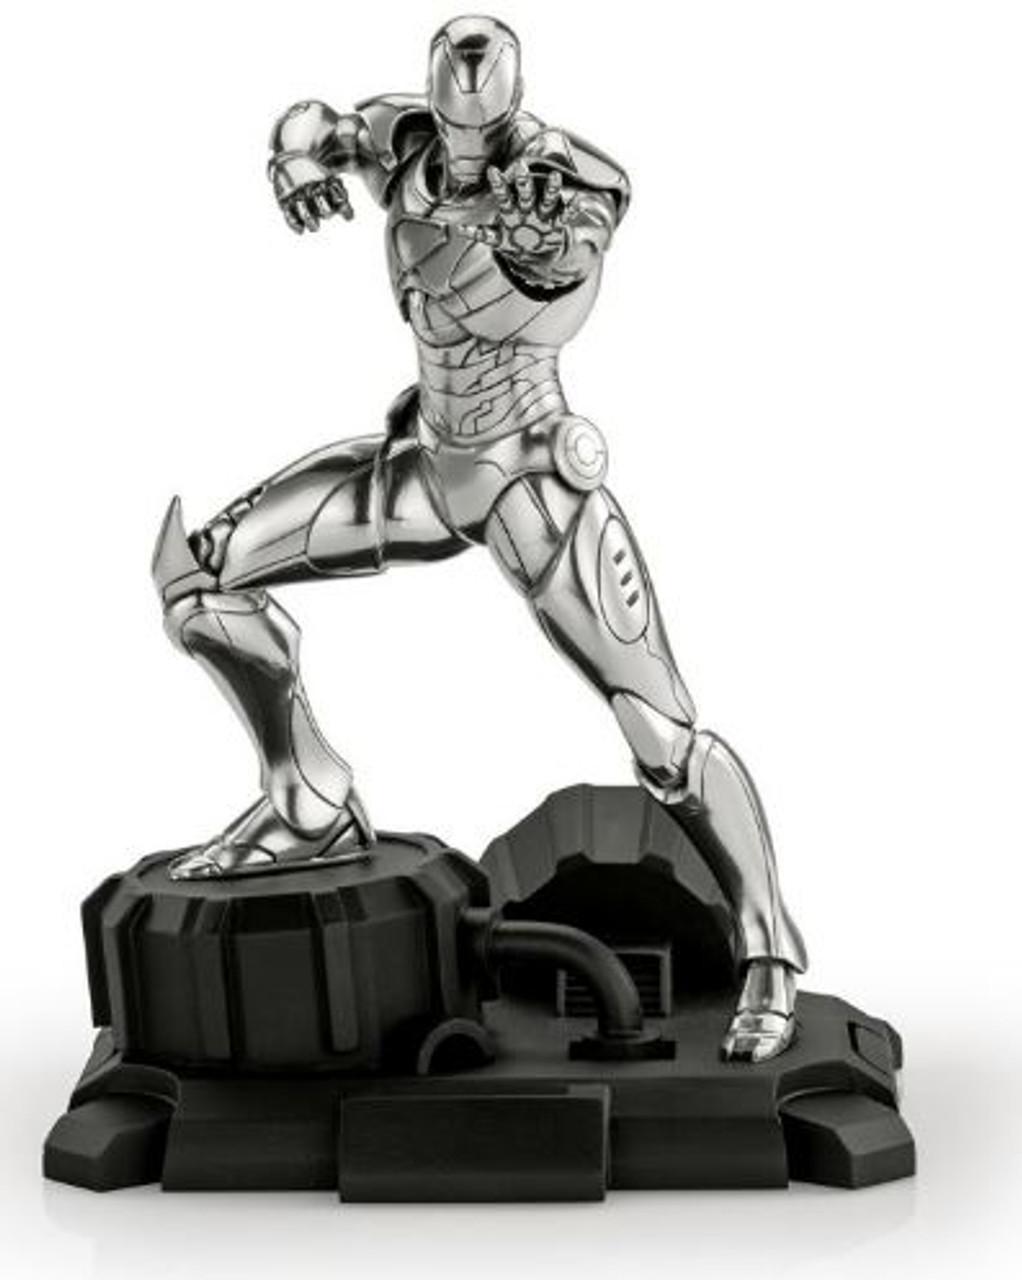 Iron Man Figurine (Limited Edition)